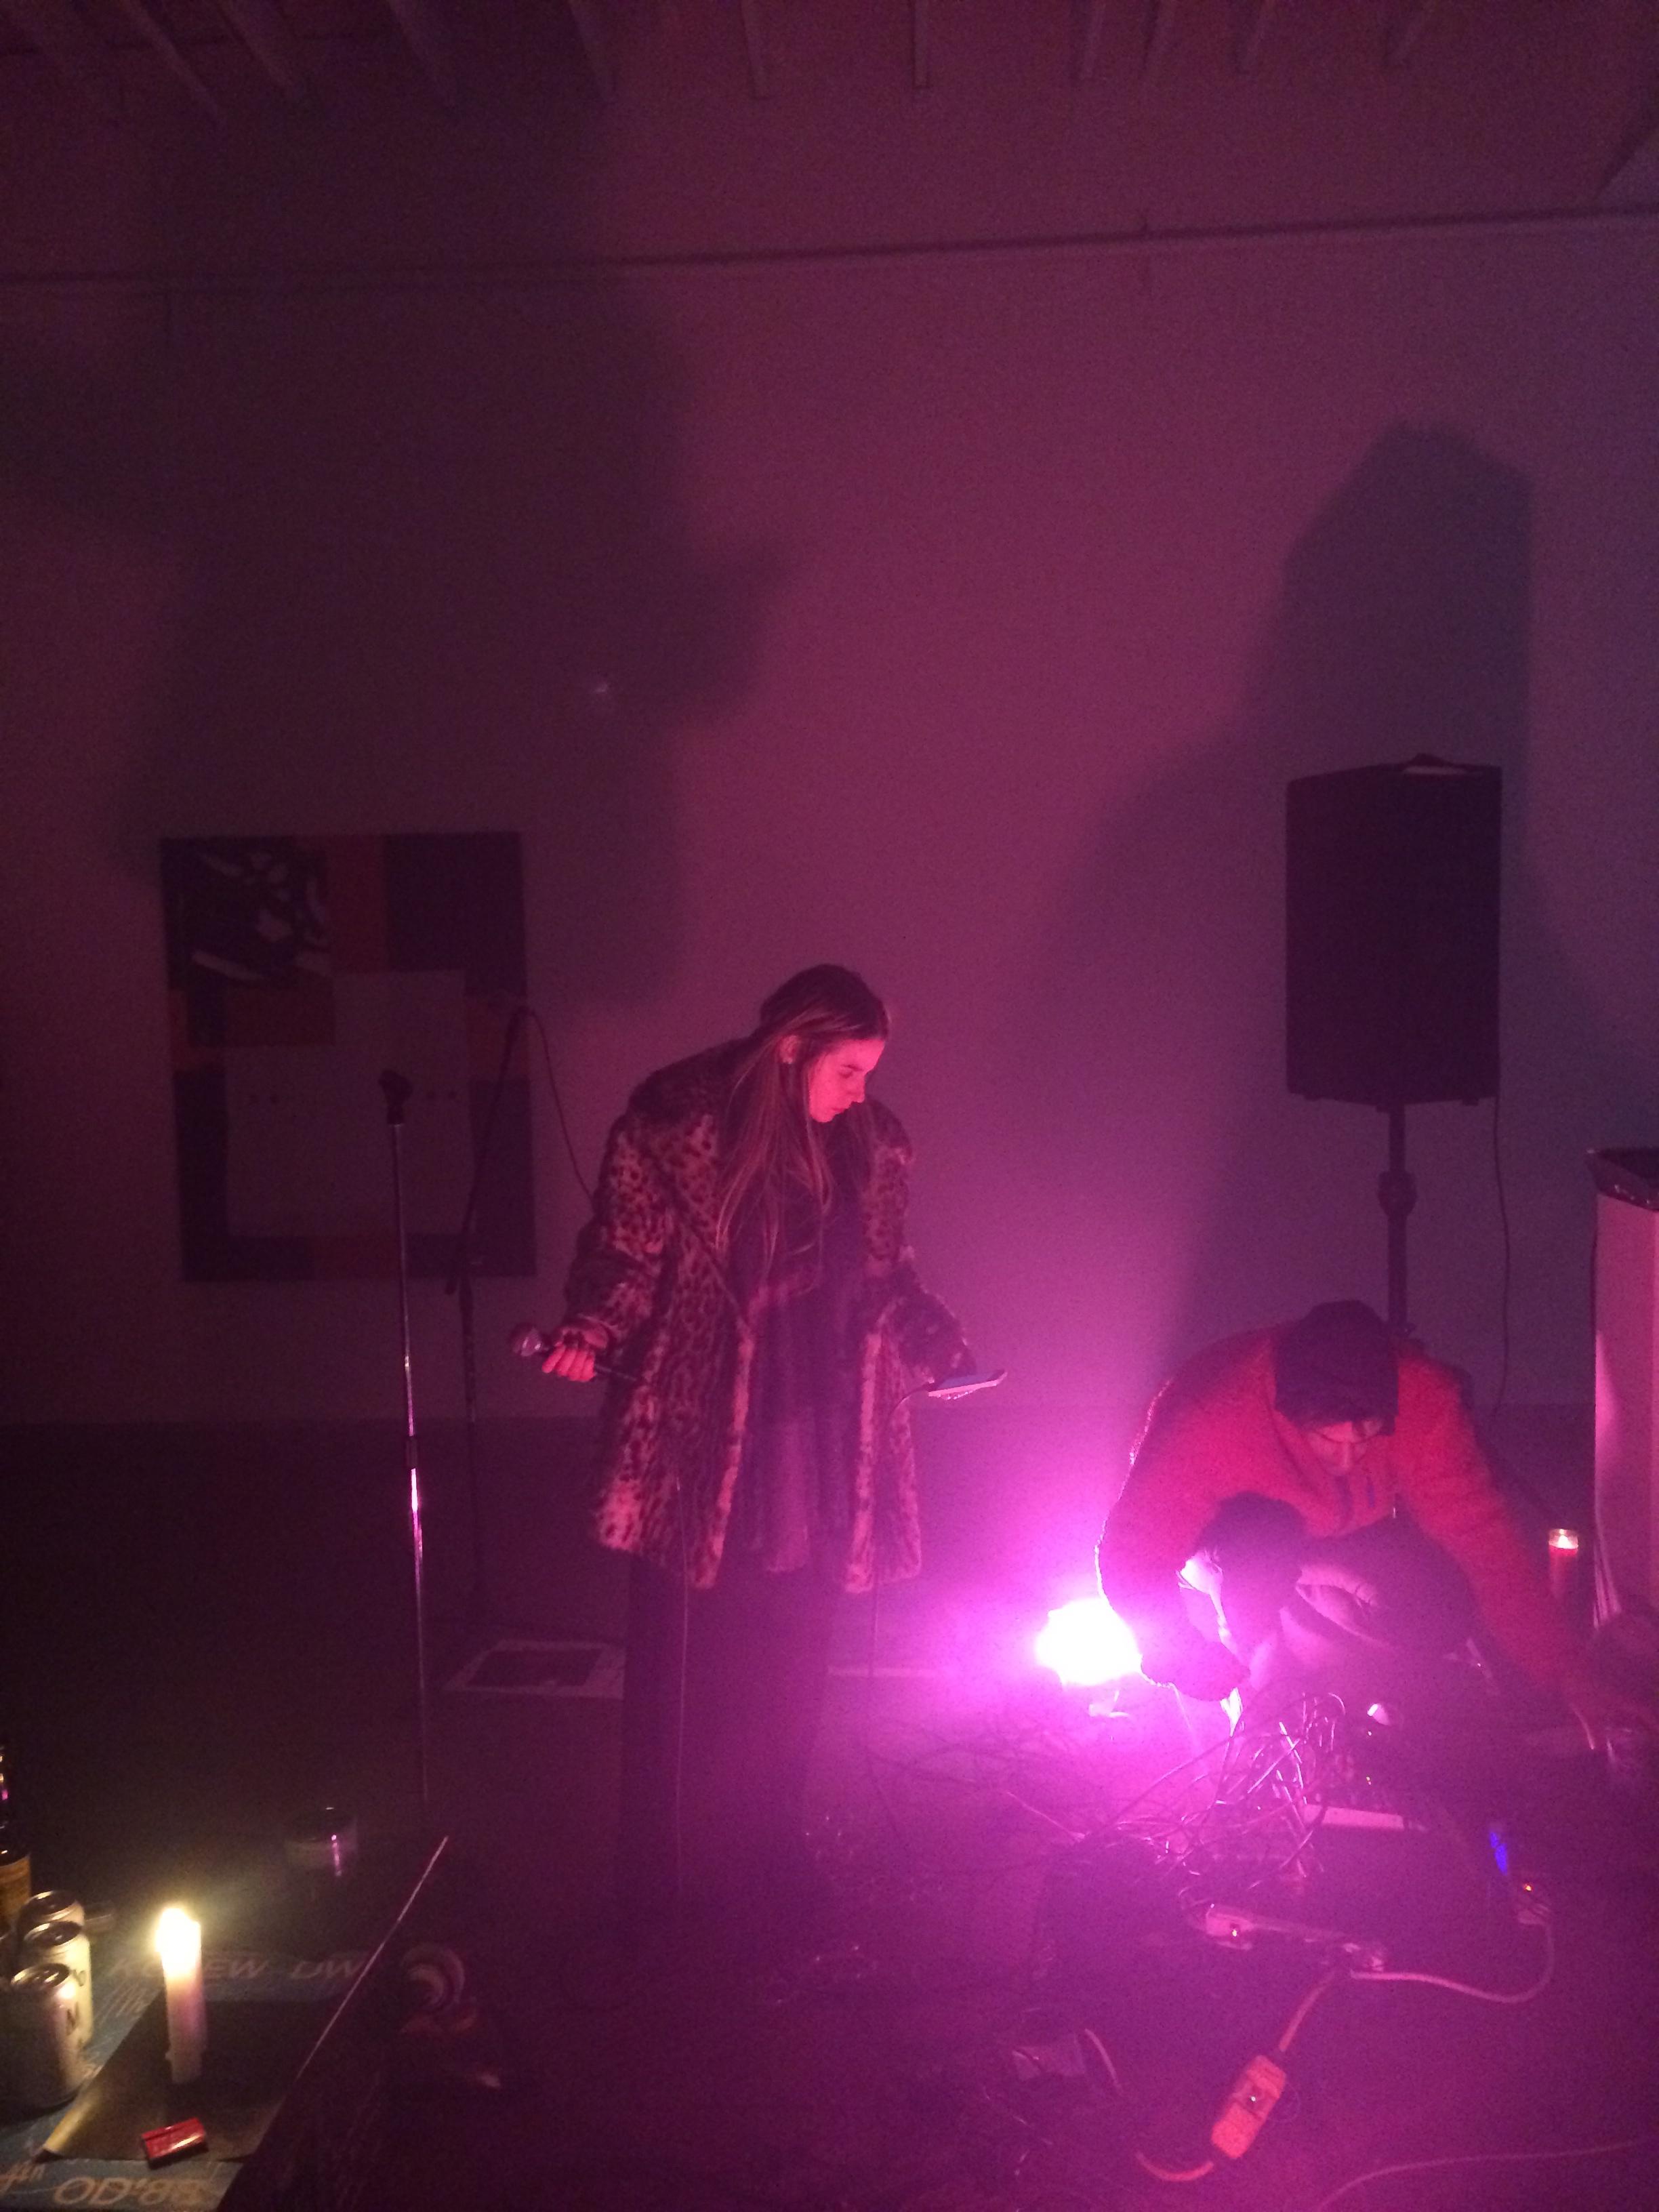 """Round Robin"" performance with Nikholis Planck, Flannery Silva, Roseboy, Elspeth Walker"